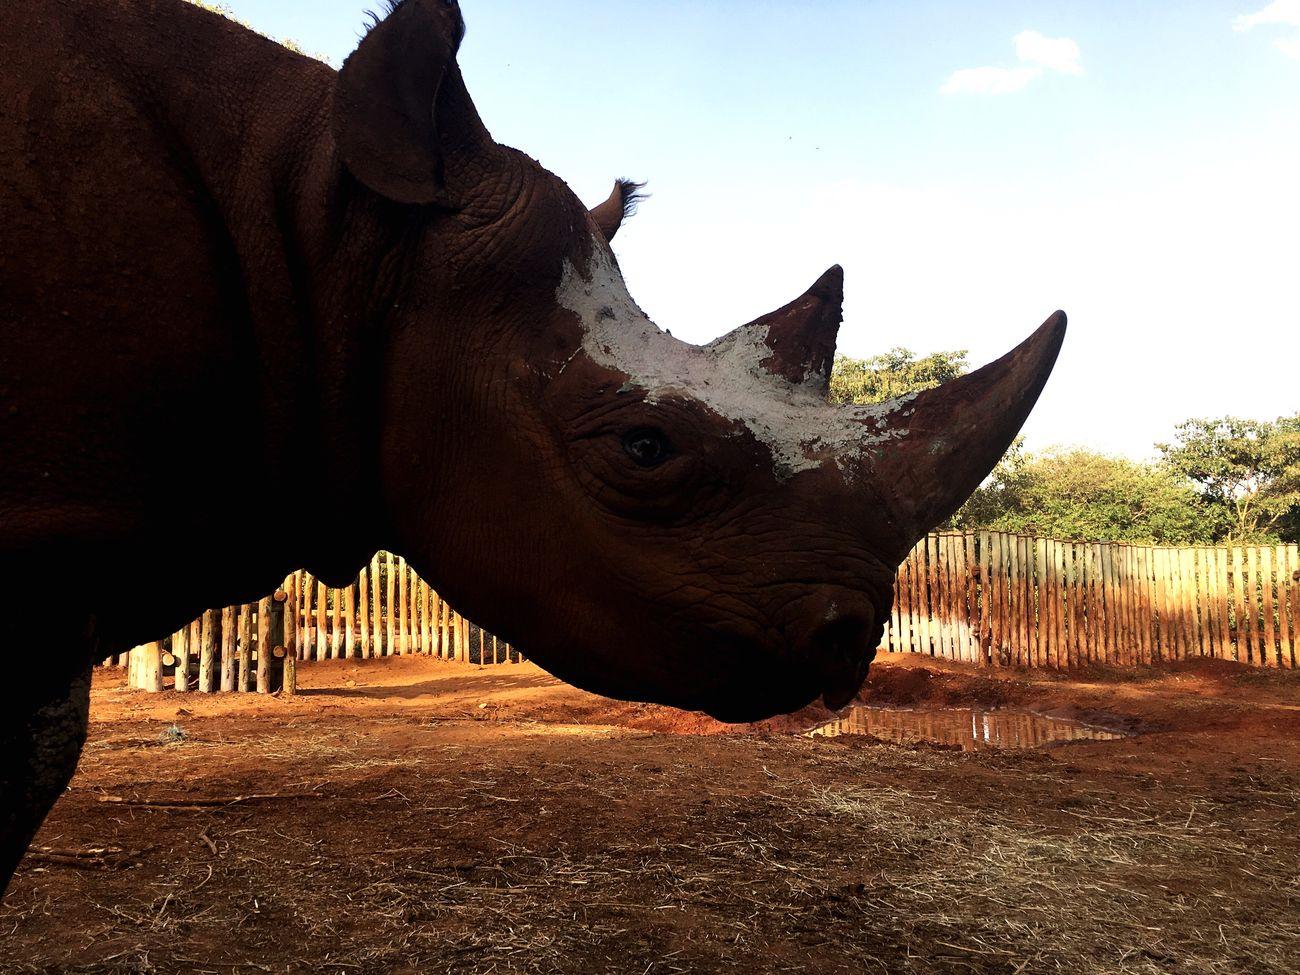 Rhino overload 🦄 Rhino Rhino Horn Kenya Nairobi Kenya Wildlife Kenya Animal